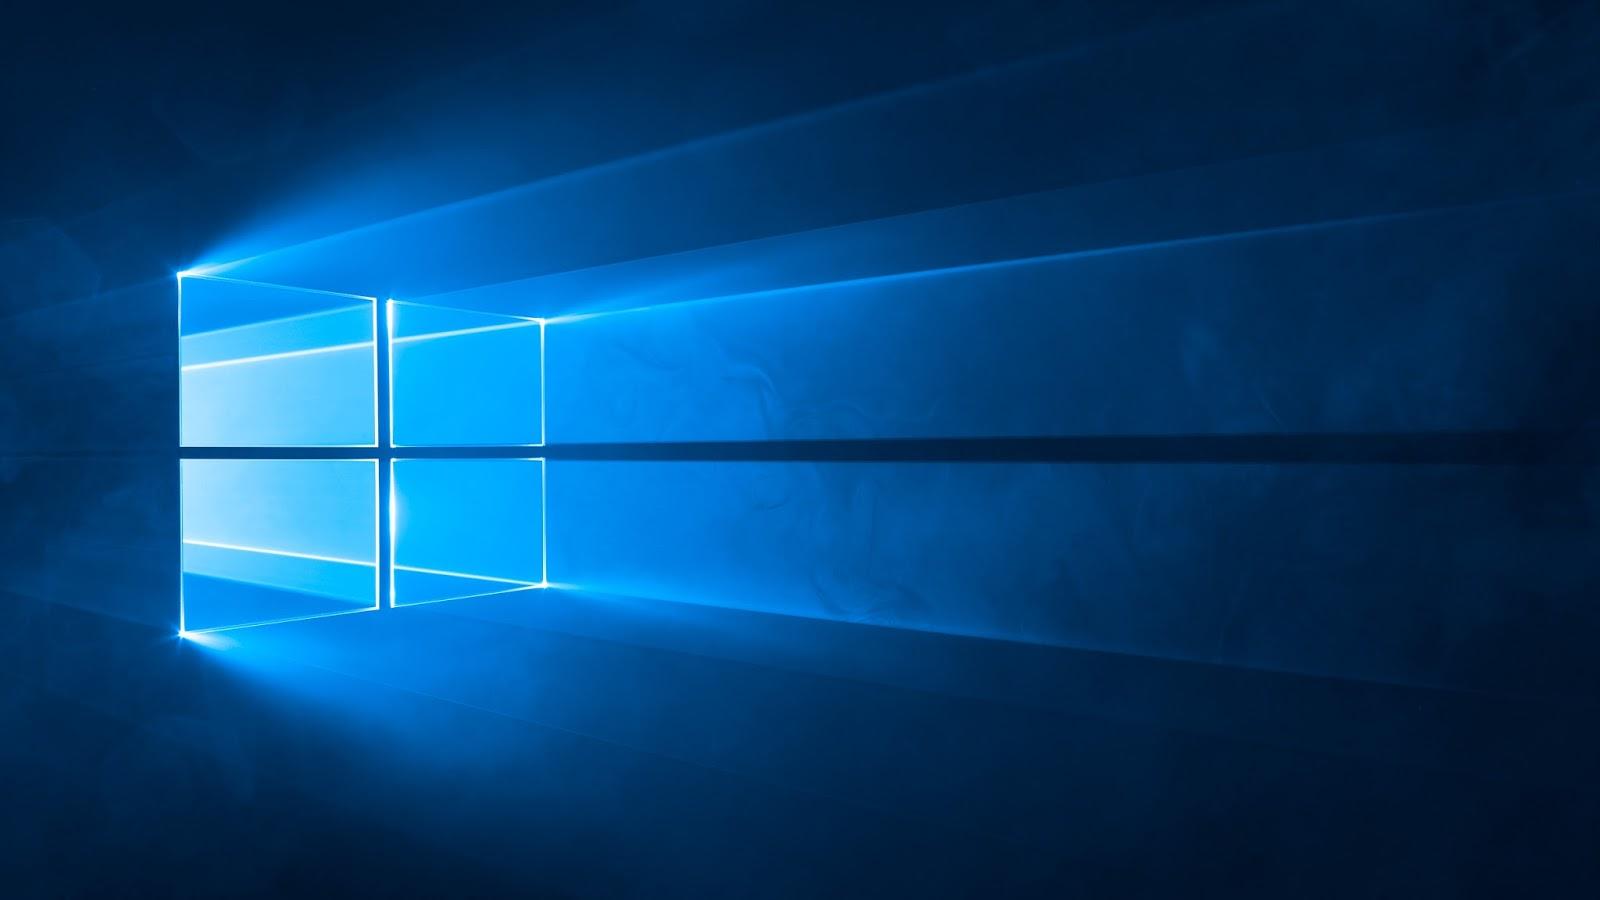 Wallpaper download for windows 10 - Windows 10 Desktop Wallpaper Hd 01 Jpg